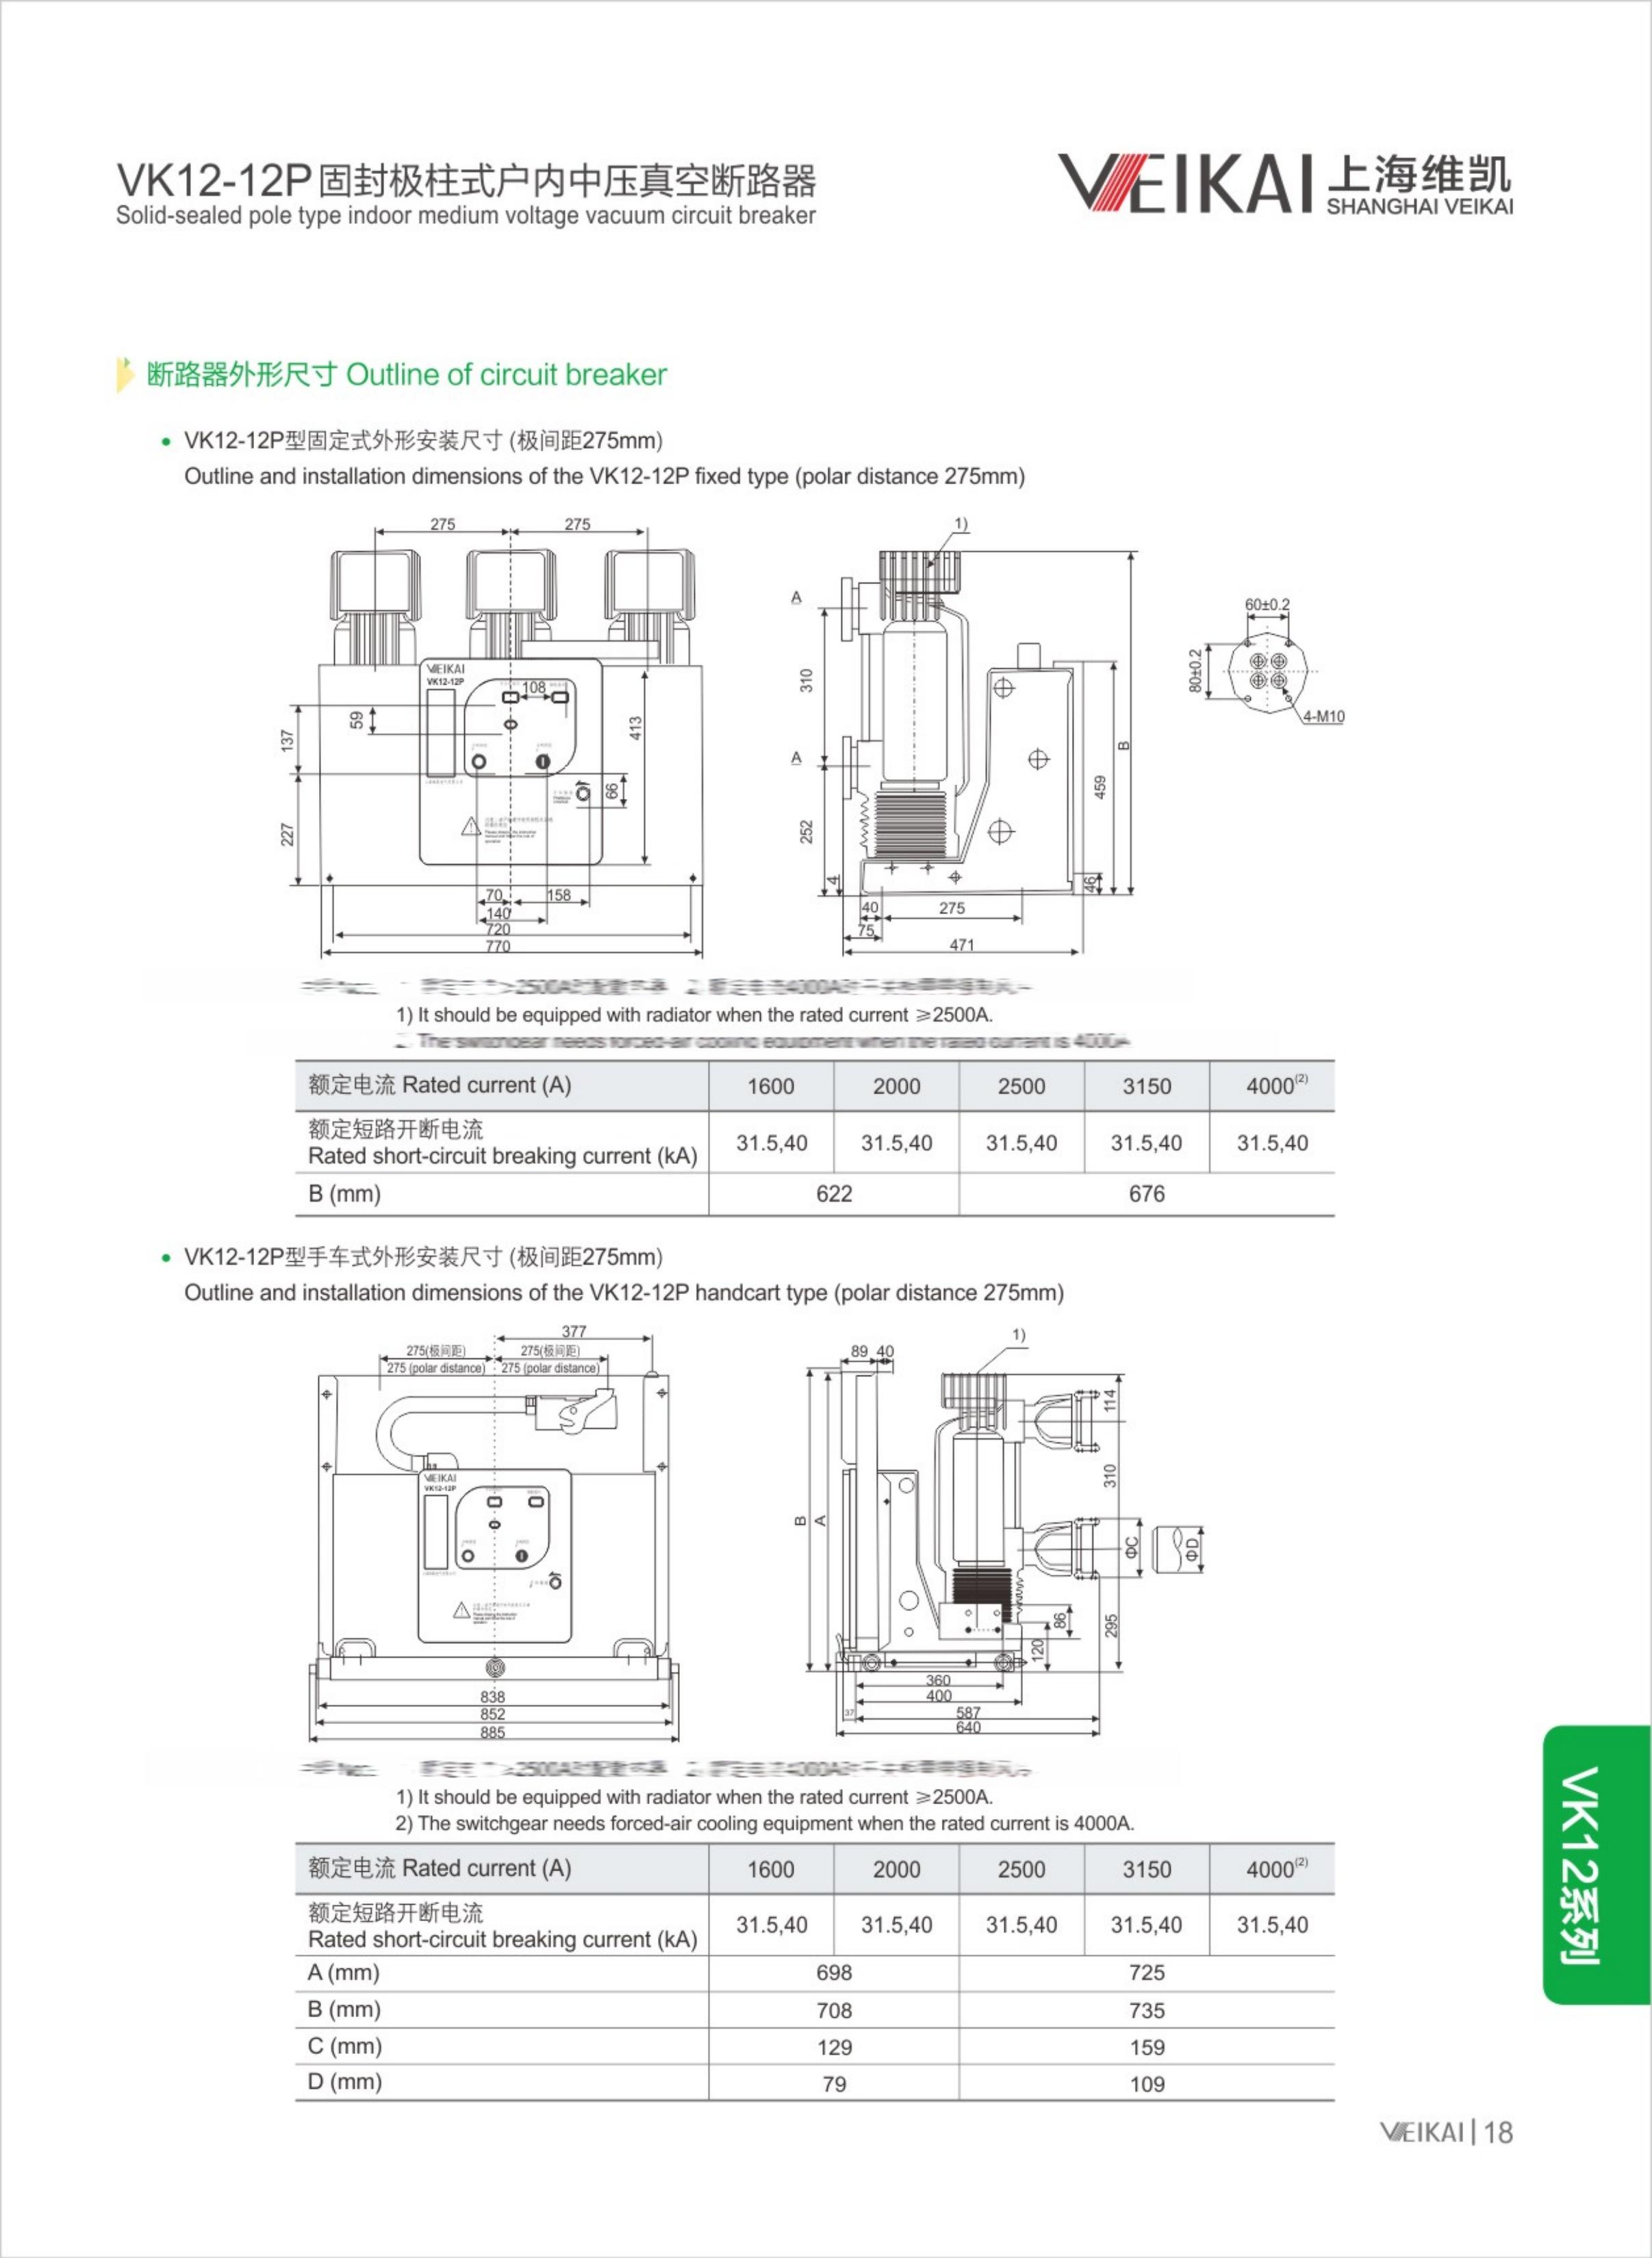 VK12系列产品选型手册_22.png